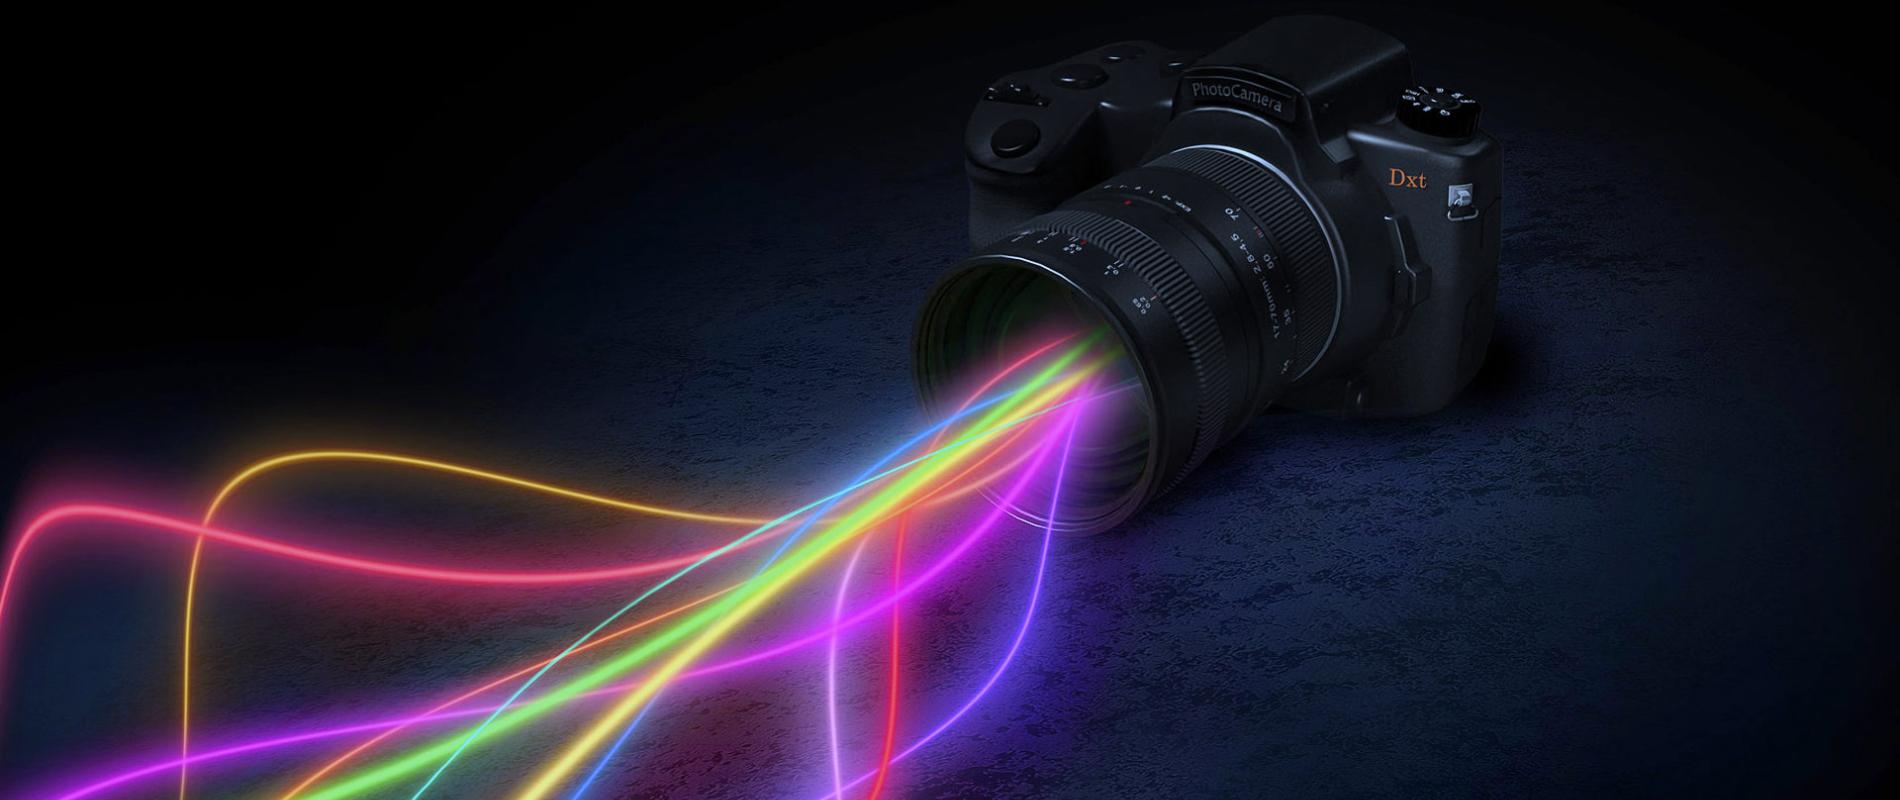 Photoshoot in Delhi | Product Photography Delhi | Best